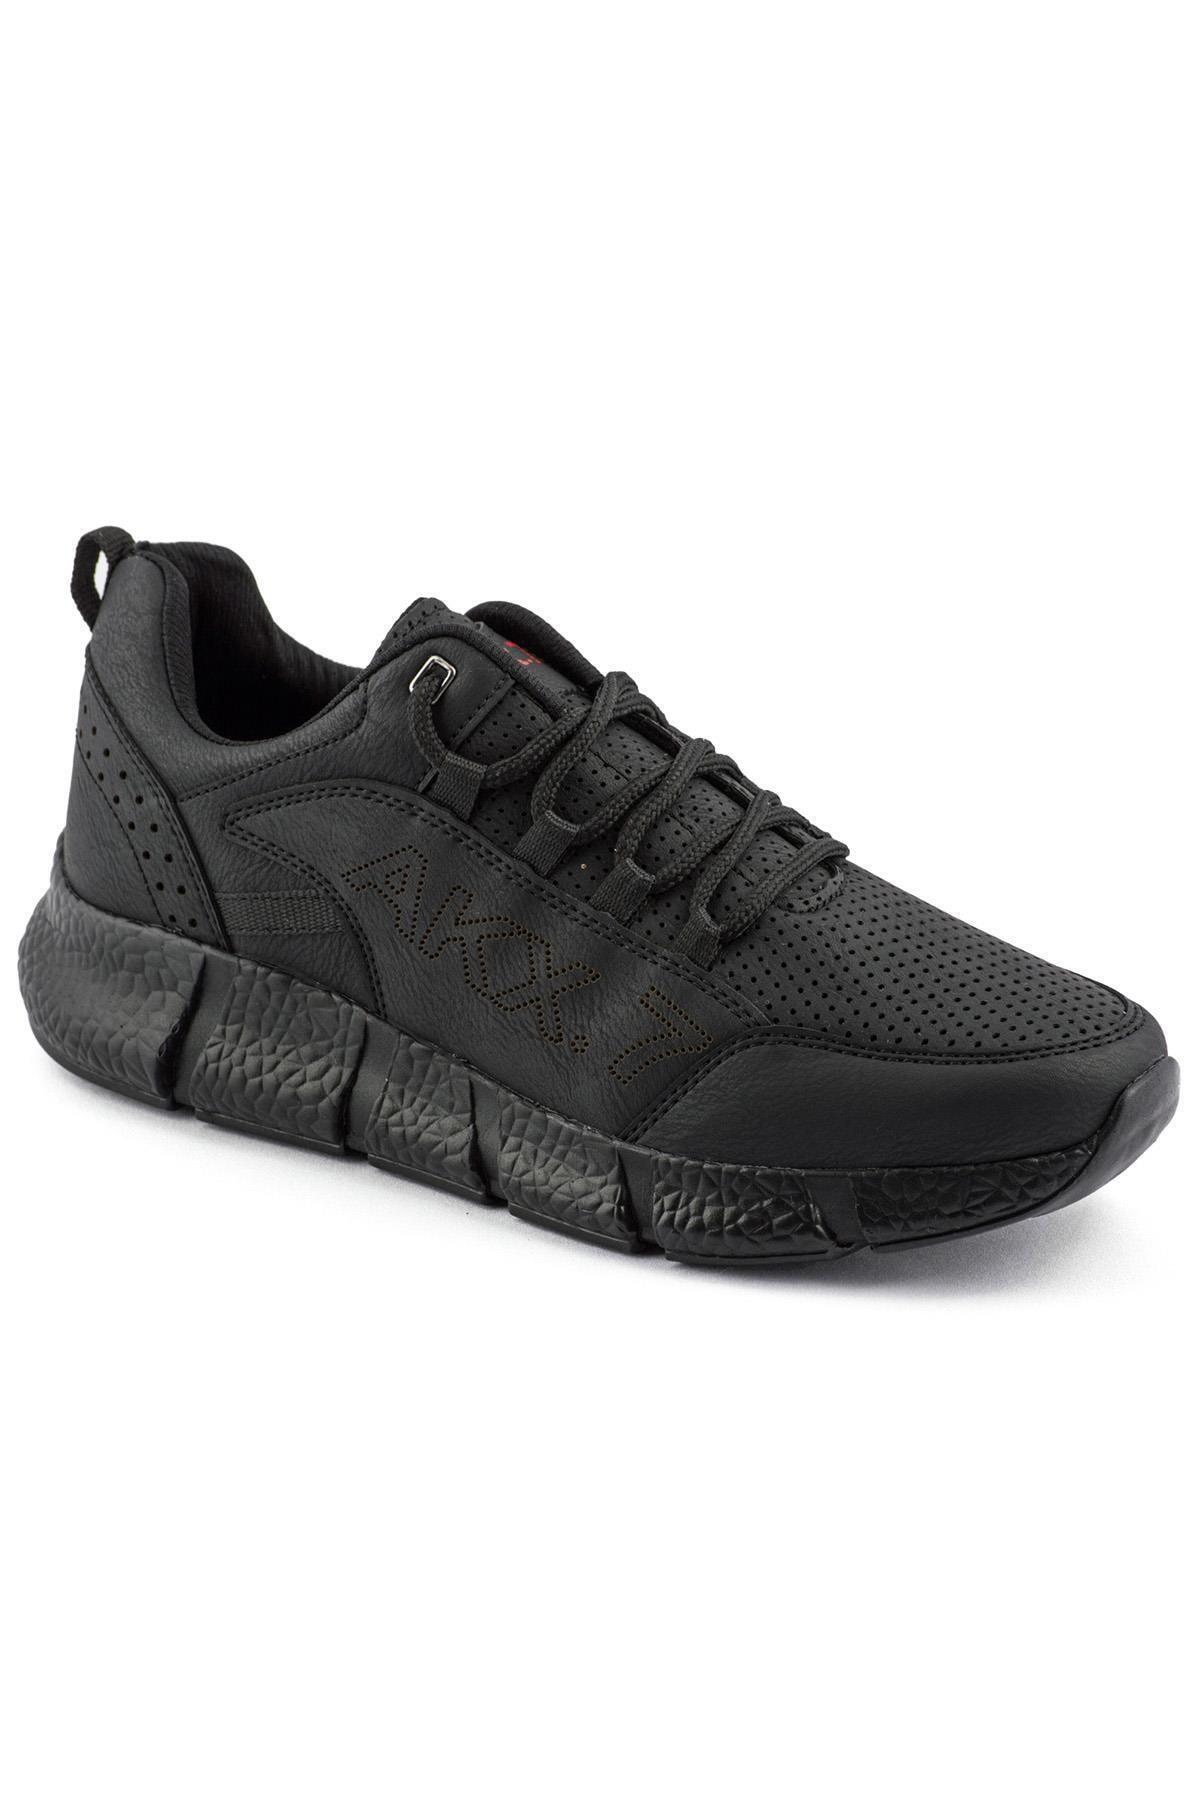 L.A Polo 021 Siyah Siyah Erkek Spor Ayakkabı 1